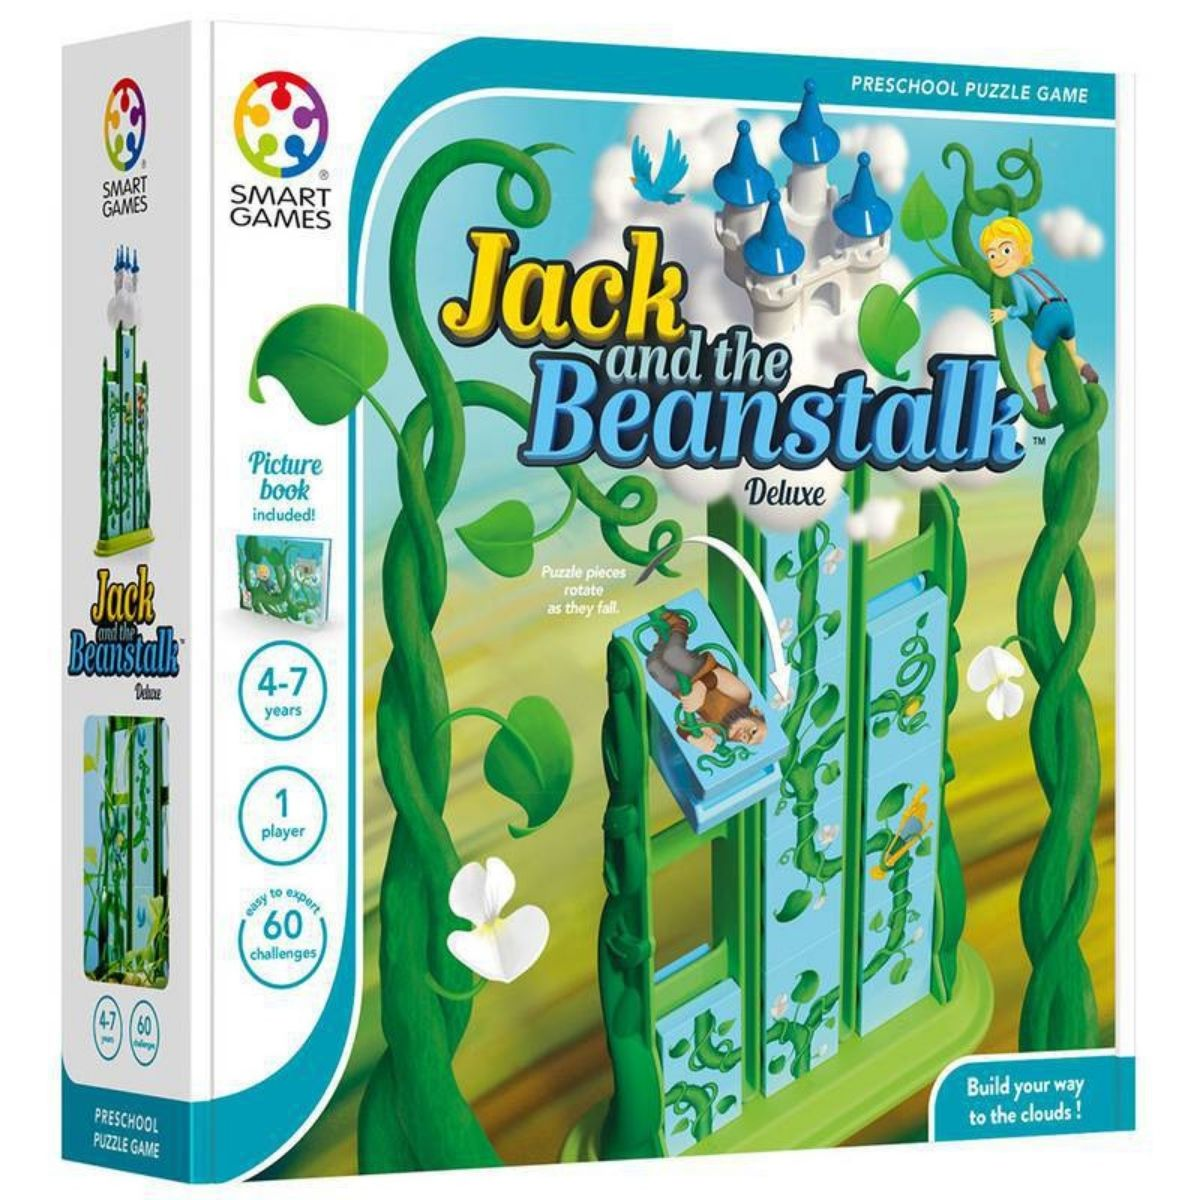 Jogo Tabuleiro Raciocínio Educativo Jack And The Beanstalk